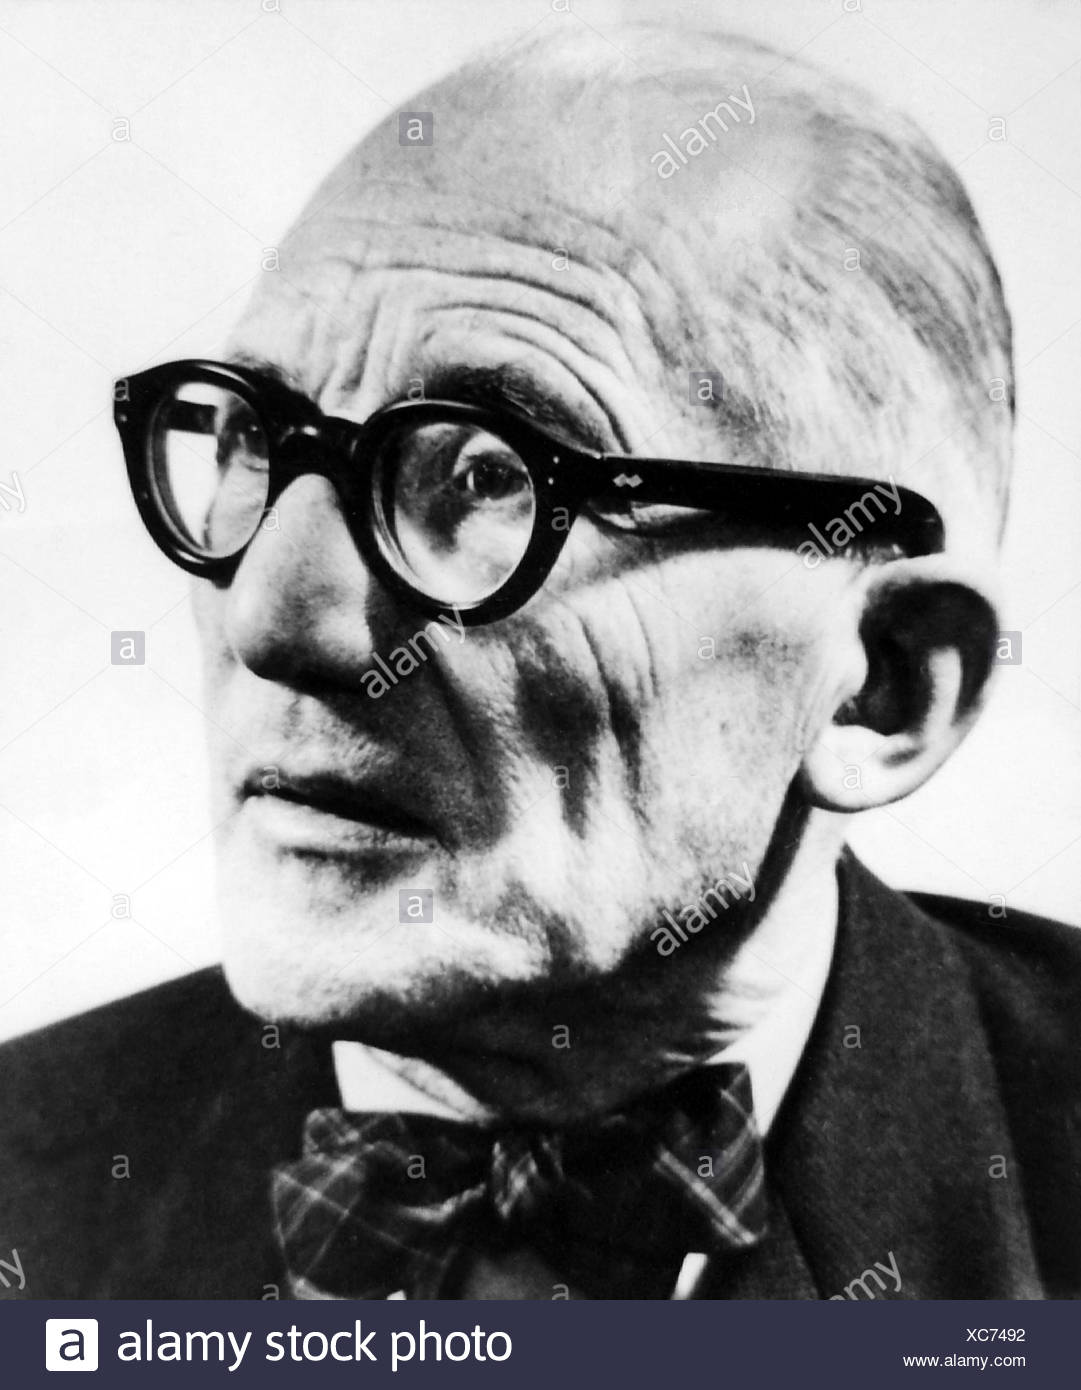 Le Corbusier (Charles-Edouard Jeanneret-Gris), 6.10.1887 - 27.8.1965, Suiza - El arquitecto francés, retrato, 1950 Additional-Rights-juegos-NA Imagen De Stock